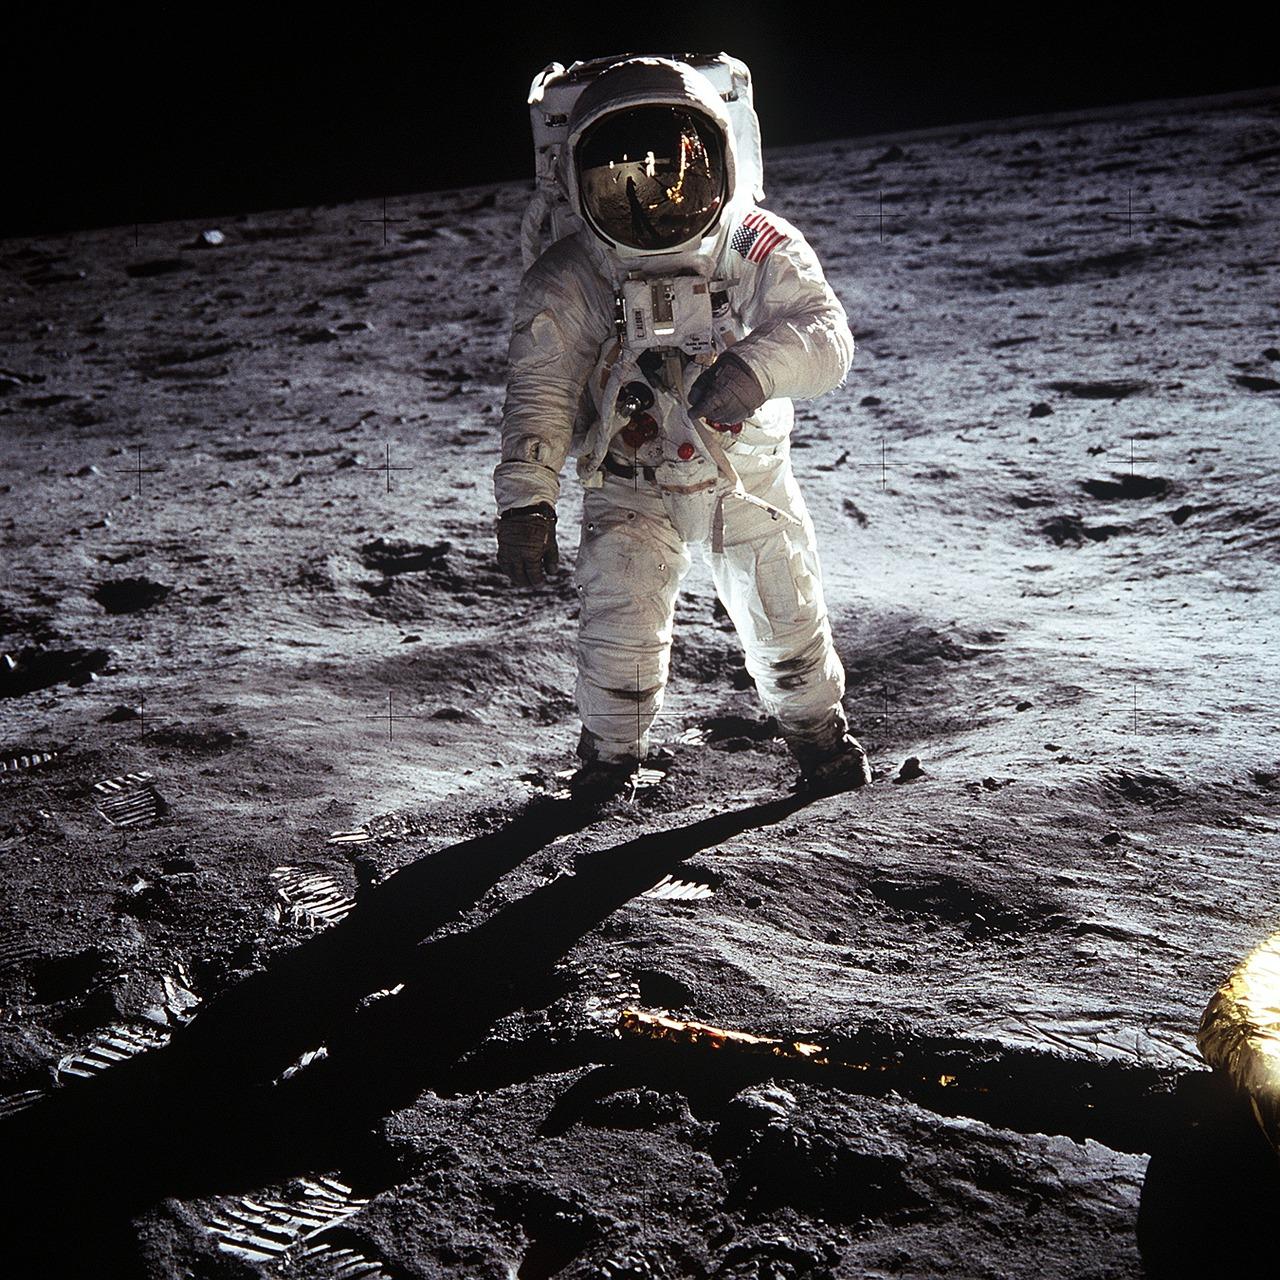 Neil Armstrong, Apollo 11 Moon Landing, 20 July, 1969.